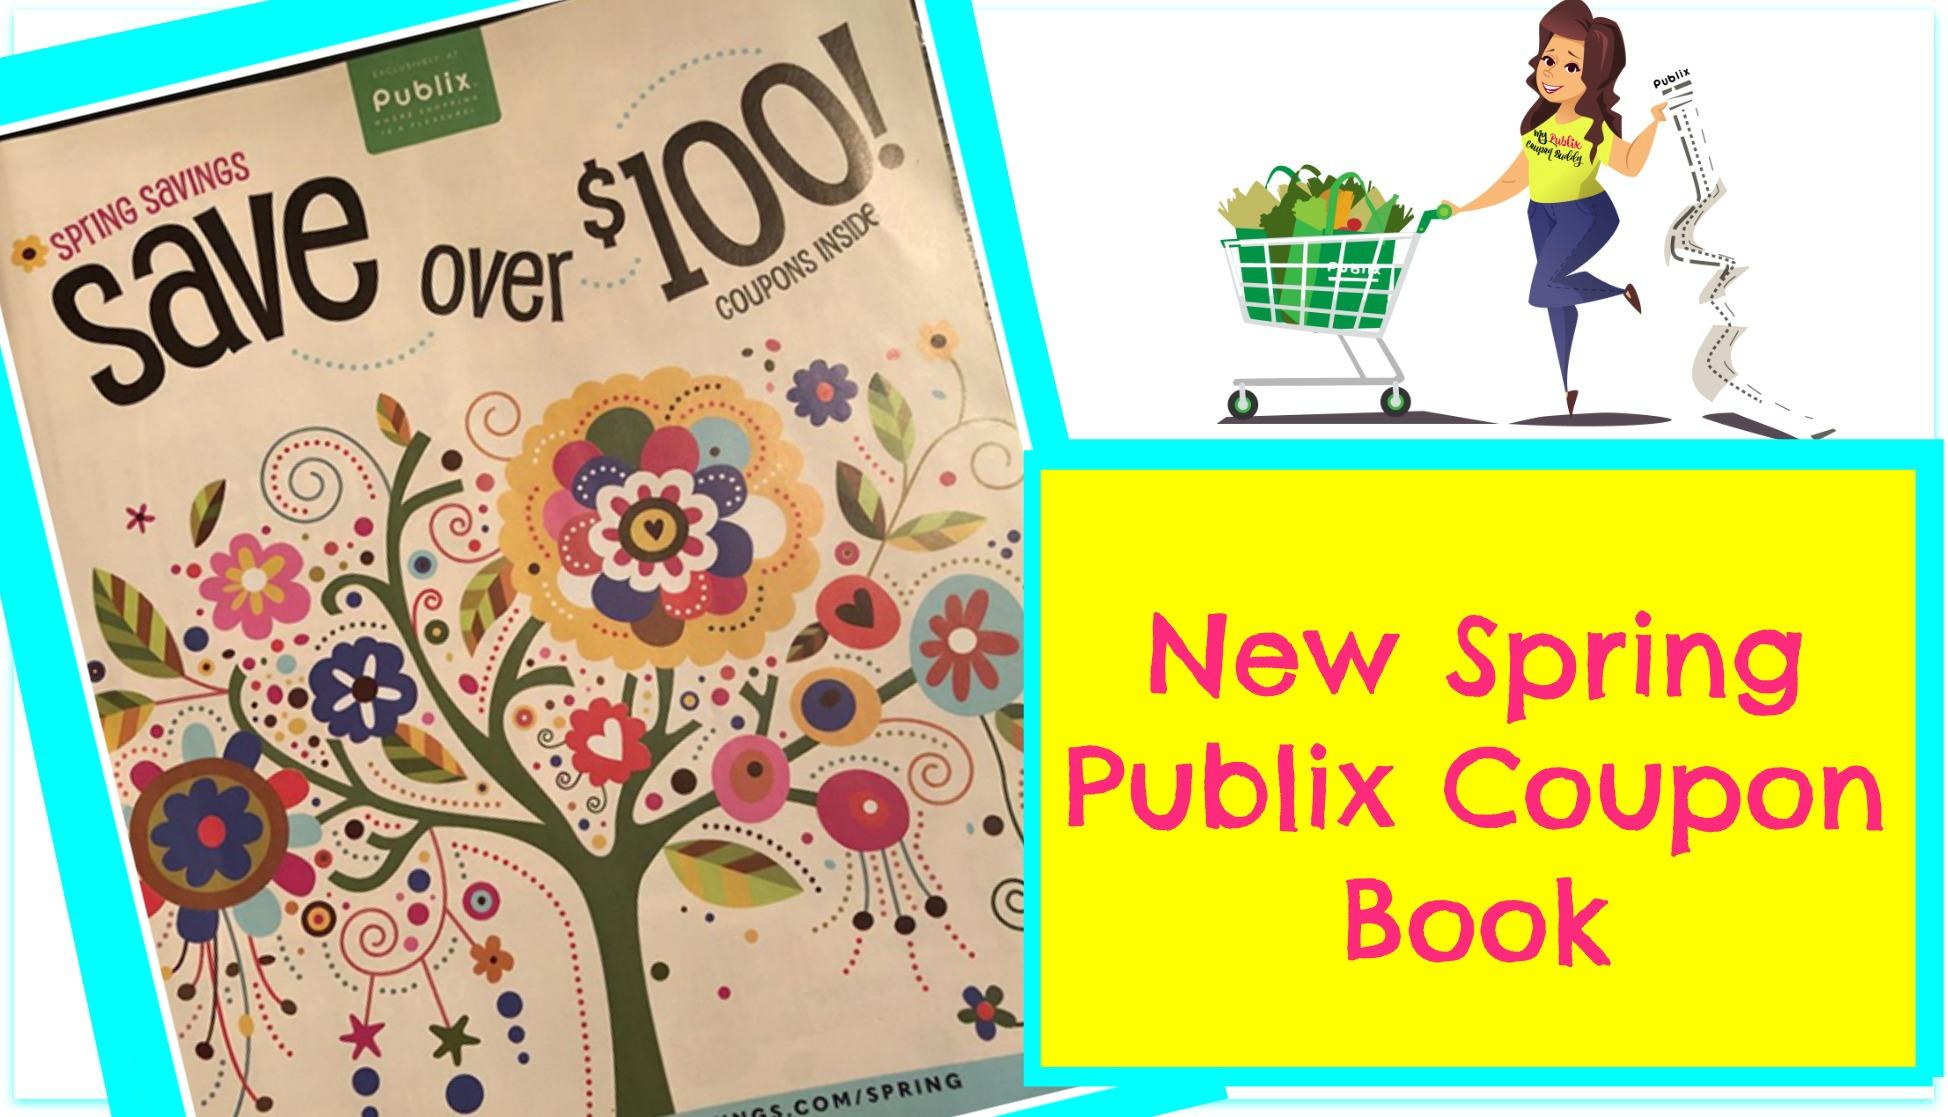 Publix Spring Coupon Book 3 24 4 22